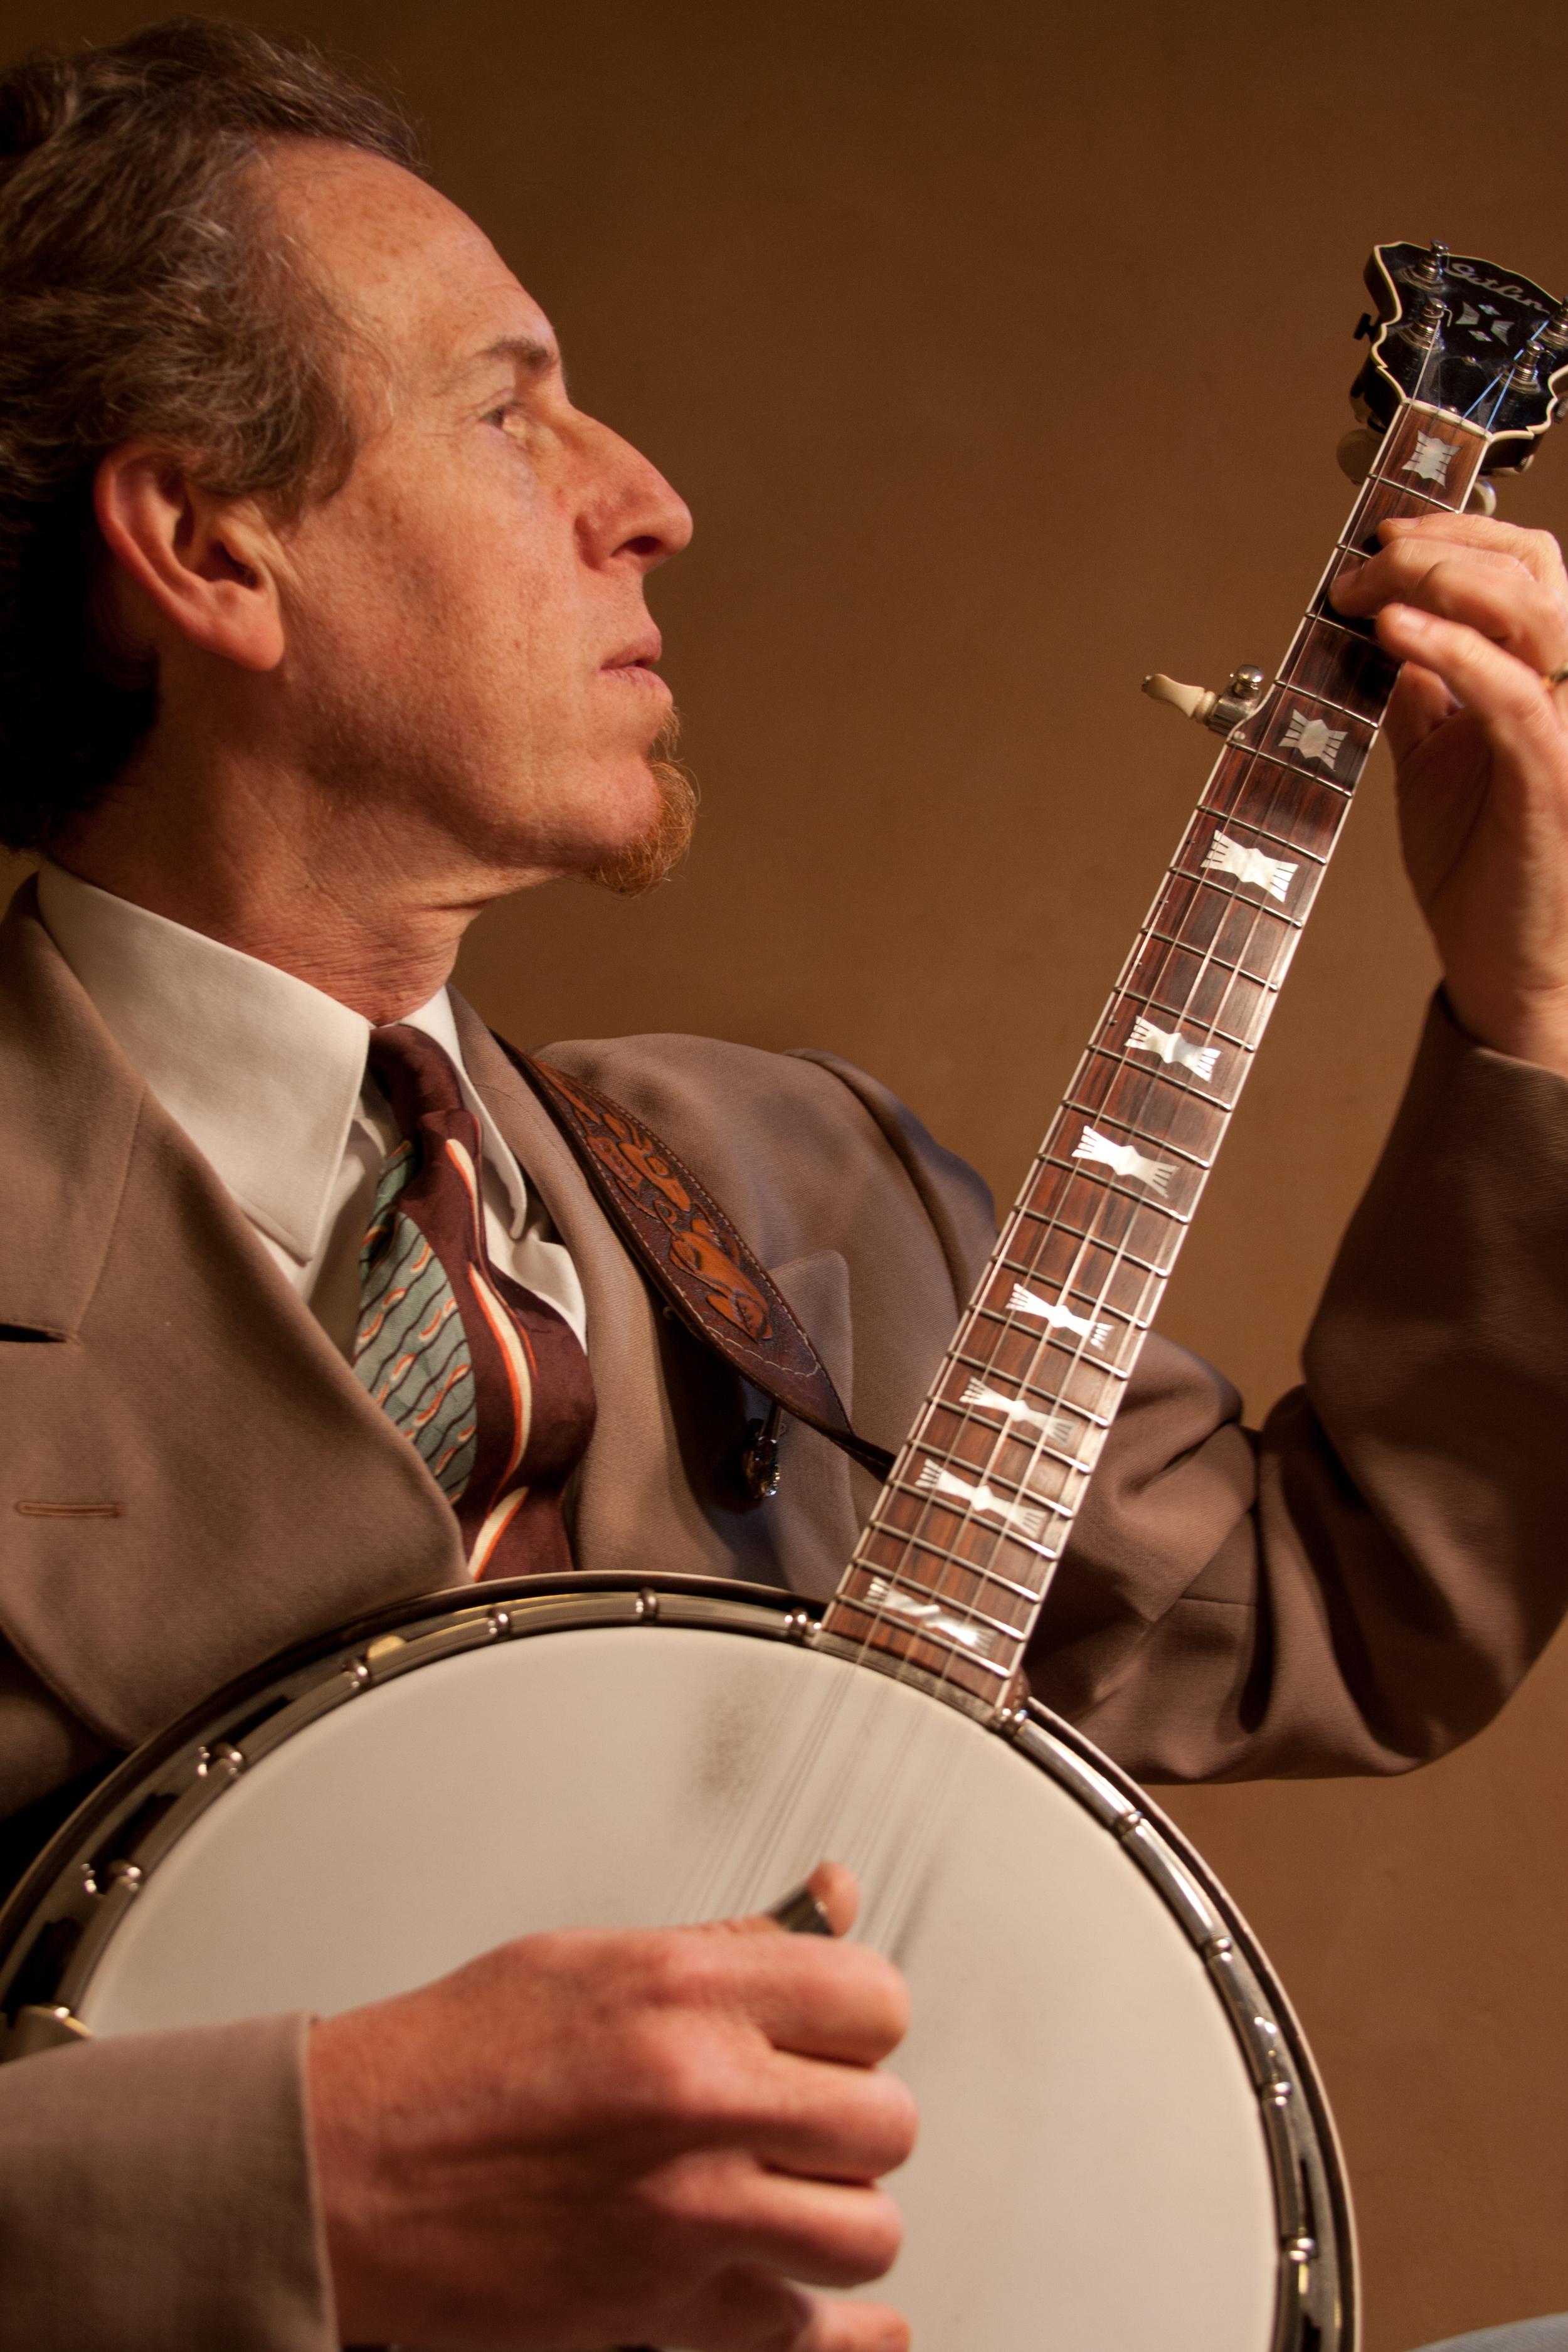 Ira banjo 3-17-13.jpg